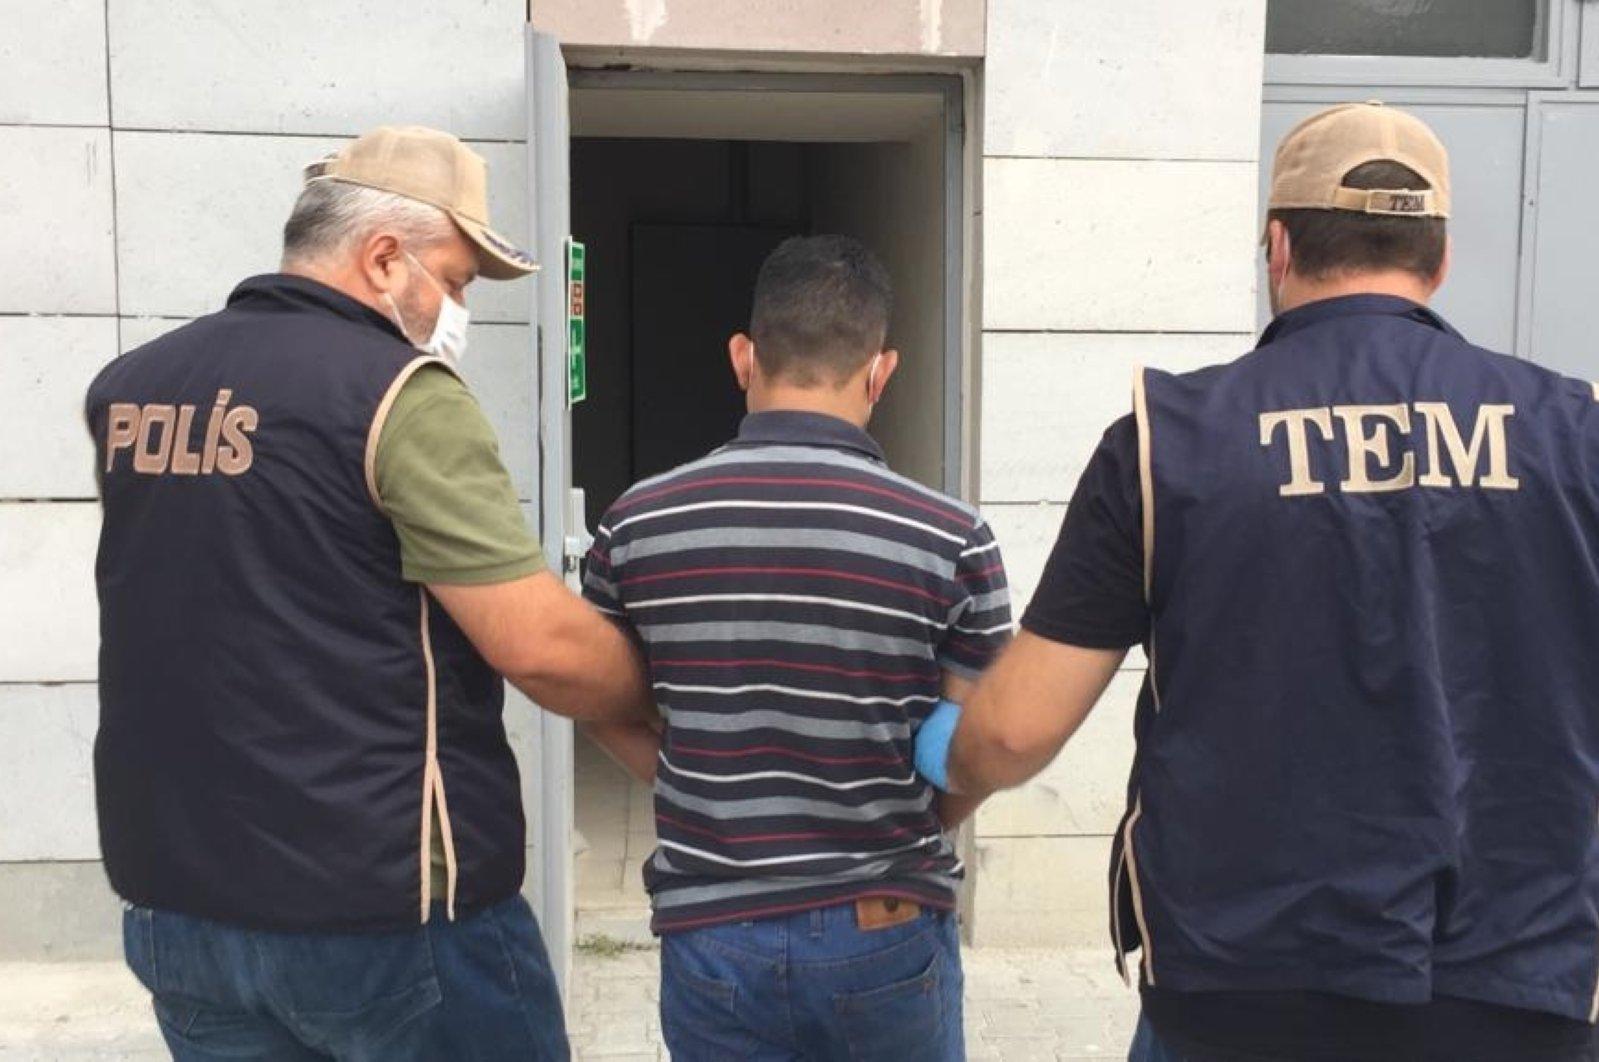 Counterterrorism police bring suspected Daesh terrorist to the police station in Samsun, Turkey on Monday, Sept. 21, 2020 (DHA Photo)